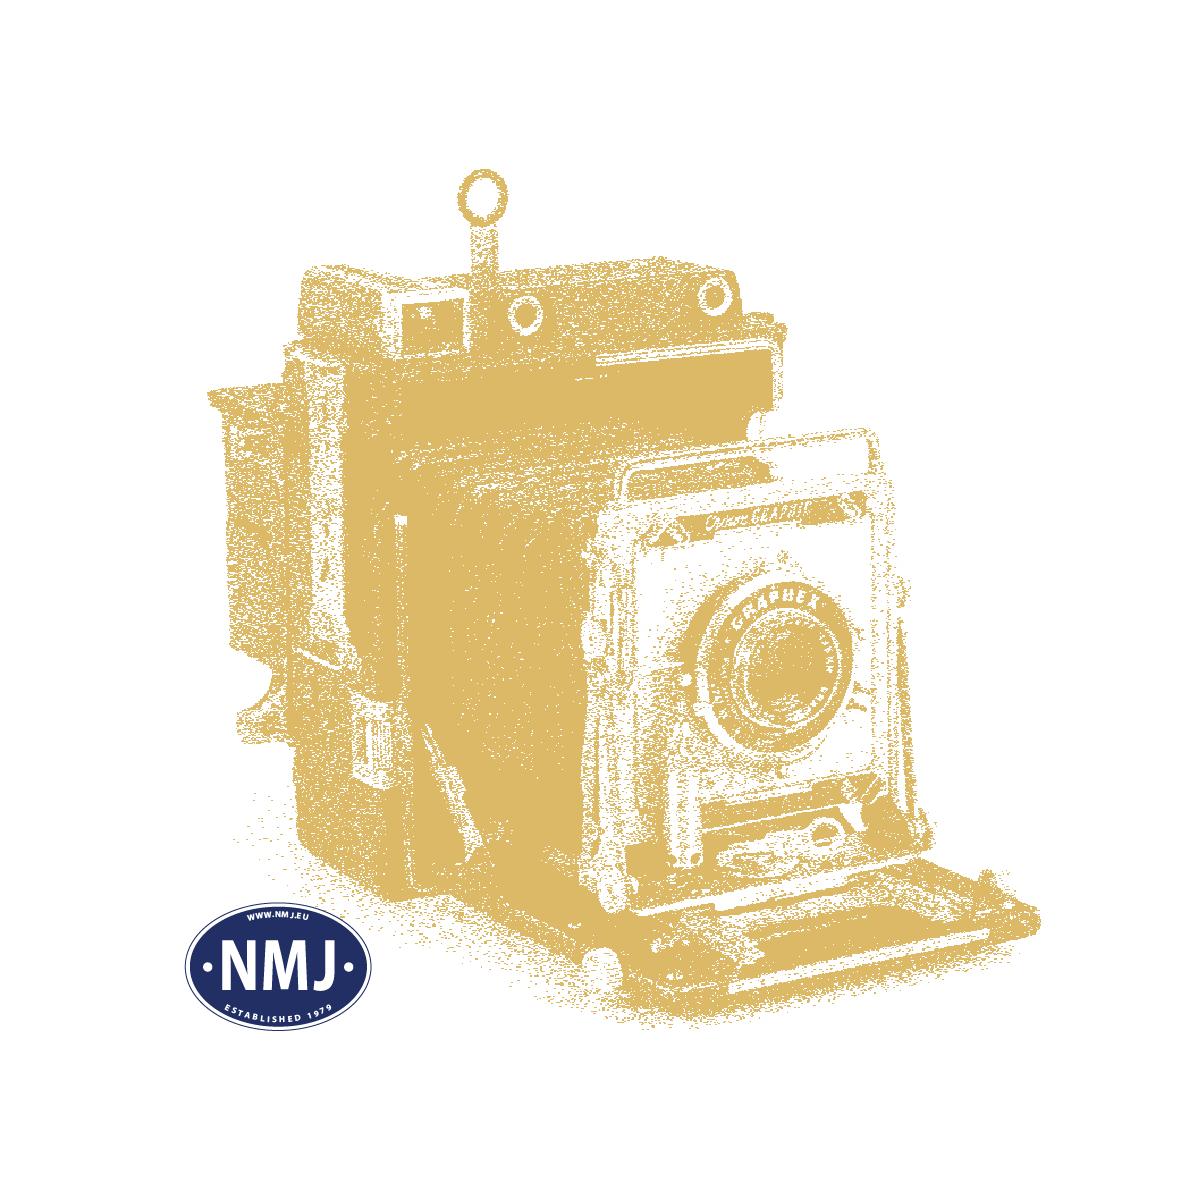 Topline Godsvogner, nmj-topline-nmjt507122-cargonet-lgns-42-77-443-2001-7-imsdal-mineral-water-containers-25-feet, NMJT507.122